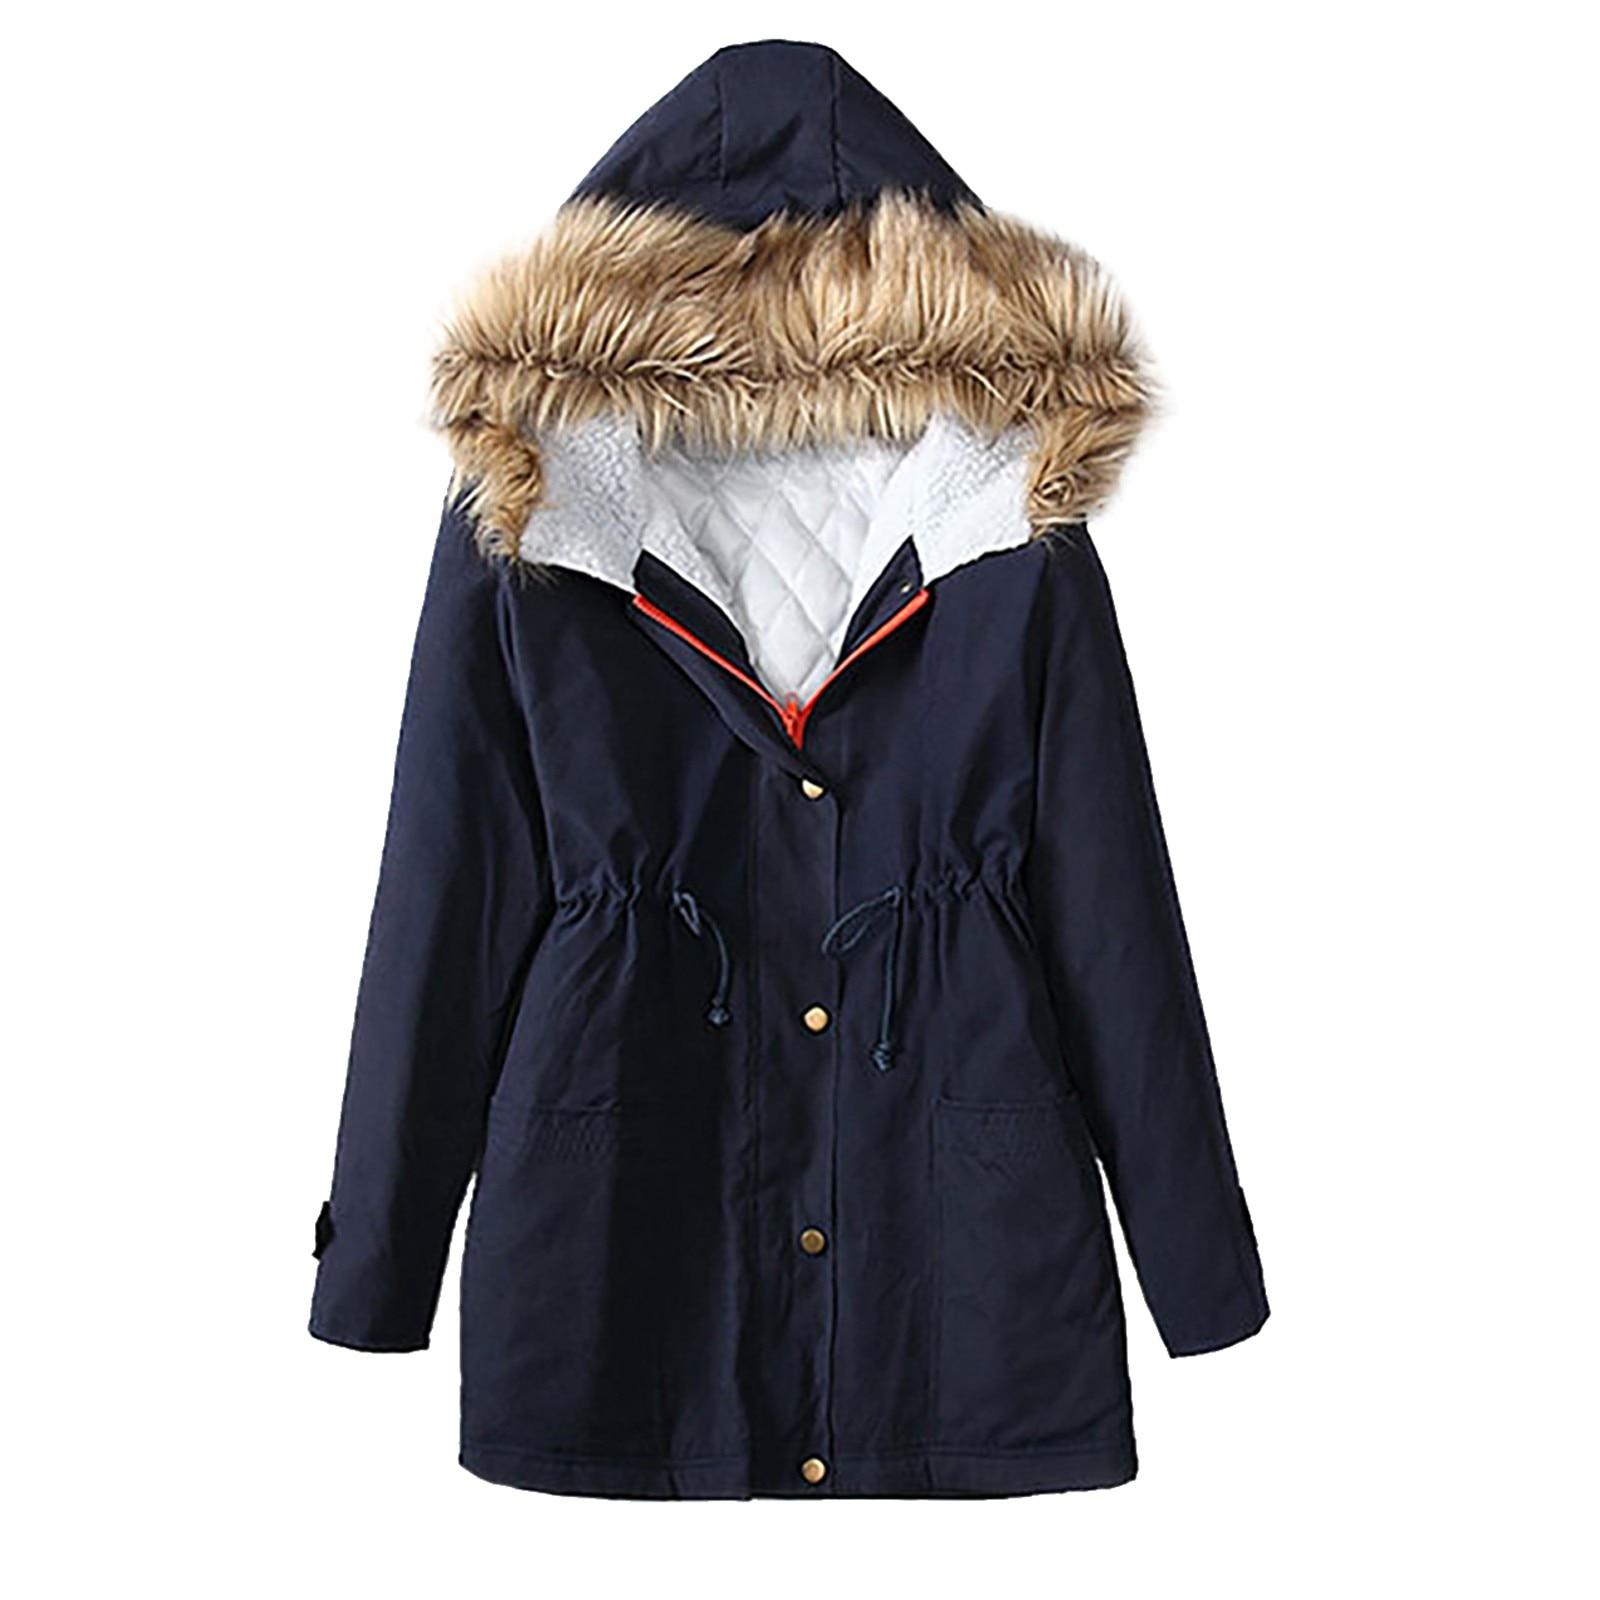 Chaqueta de algodón de manga larga con capucha Para Mujer, Chaqueta de...